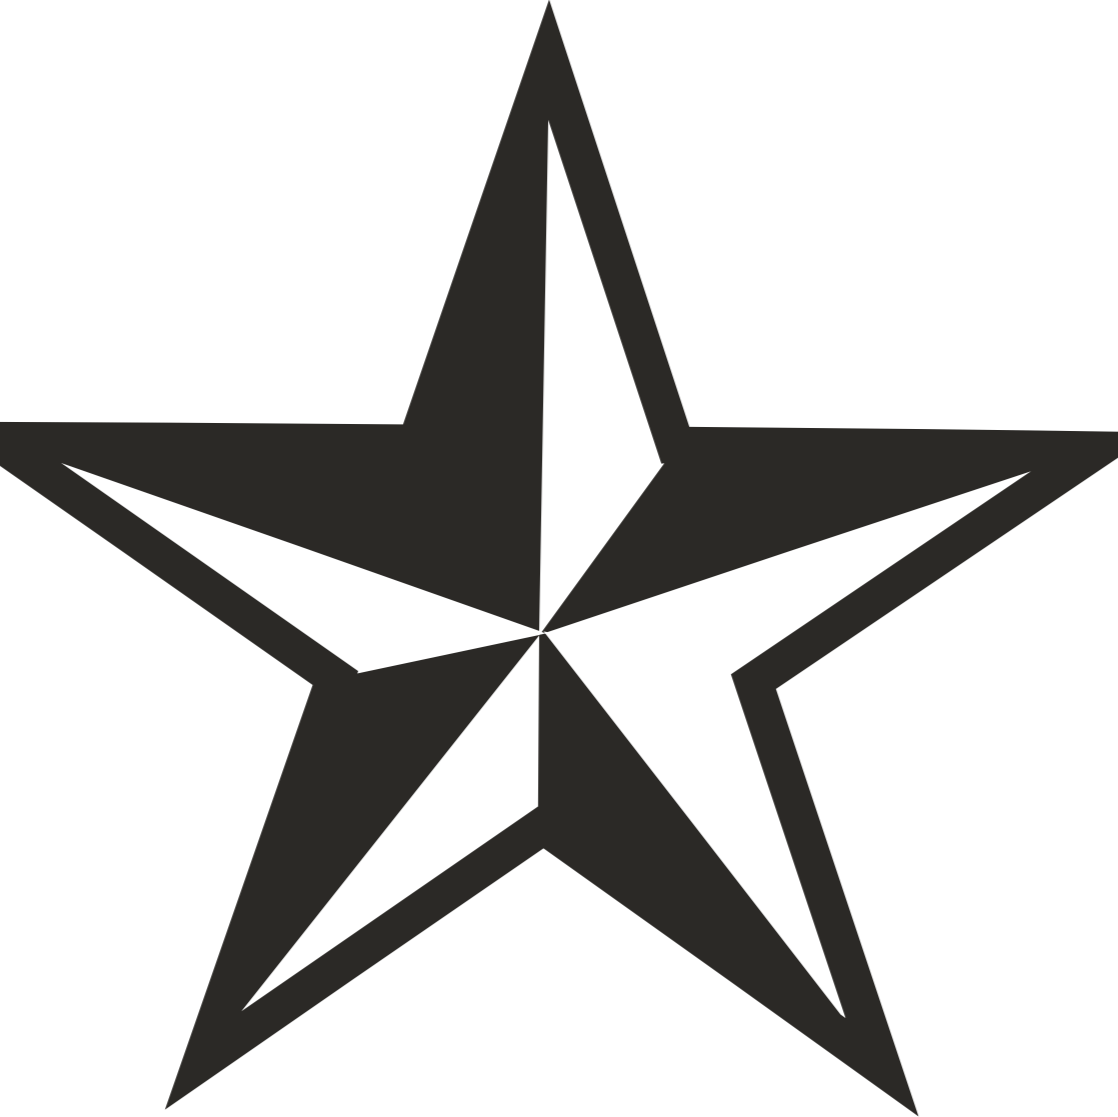 1118x1117 Texas Star Clip Art Images Clipart 2 Image